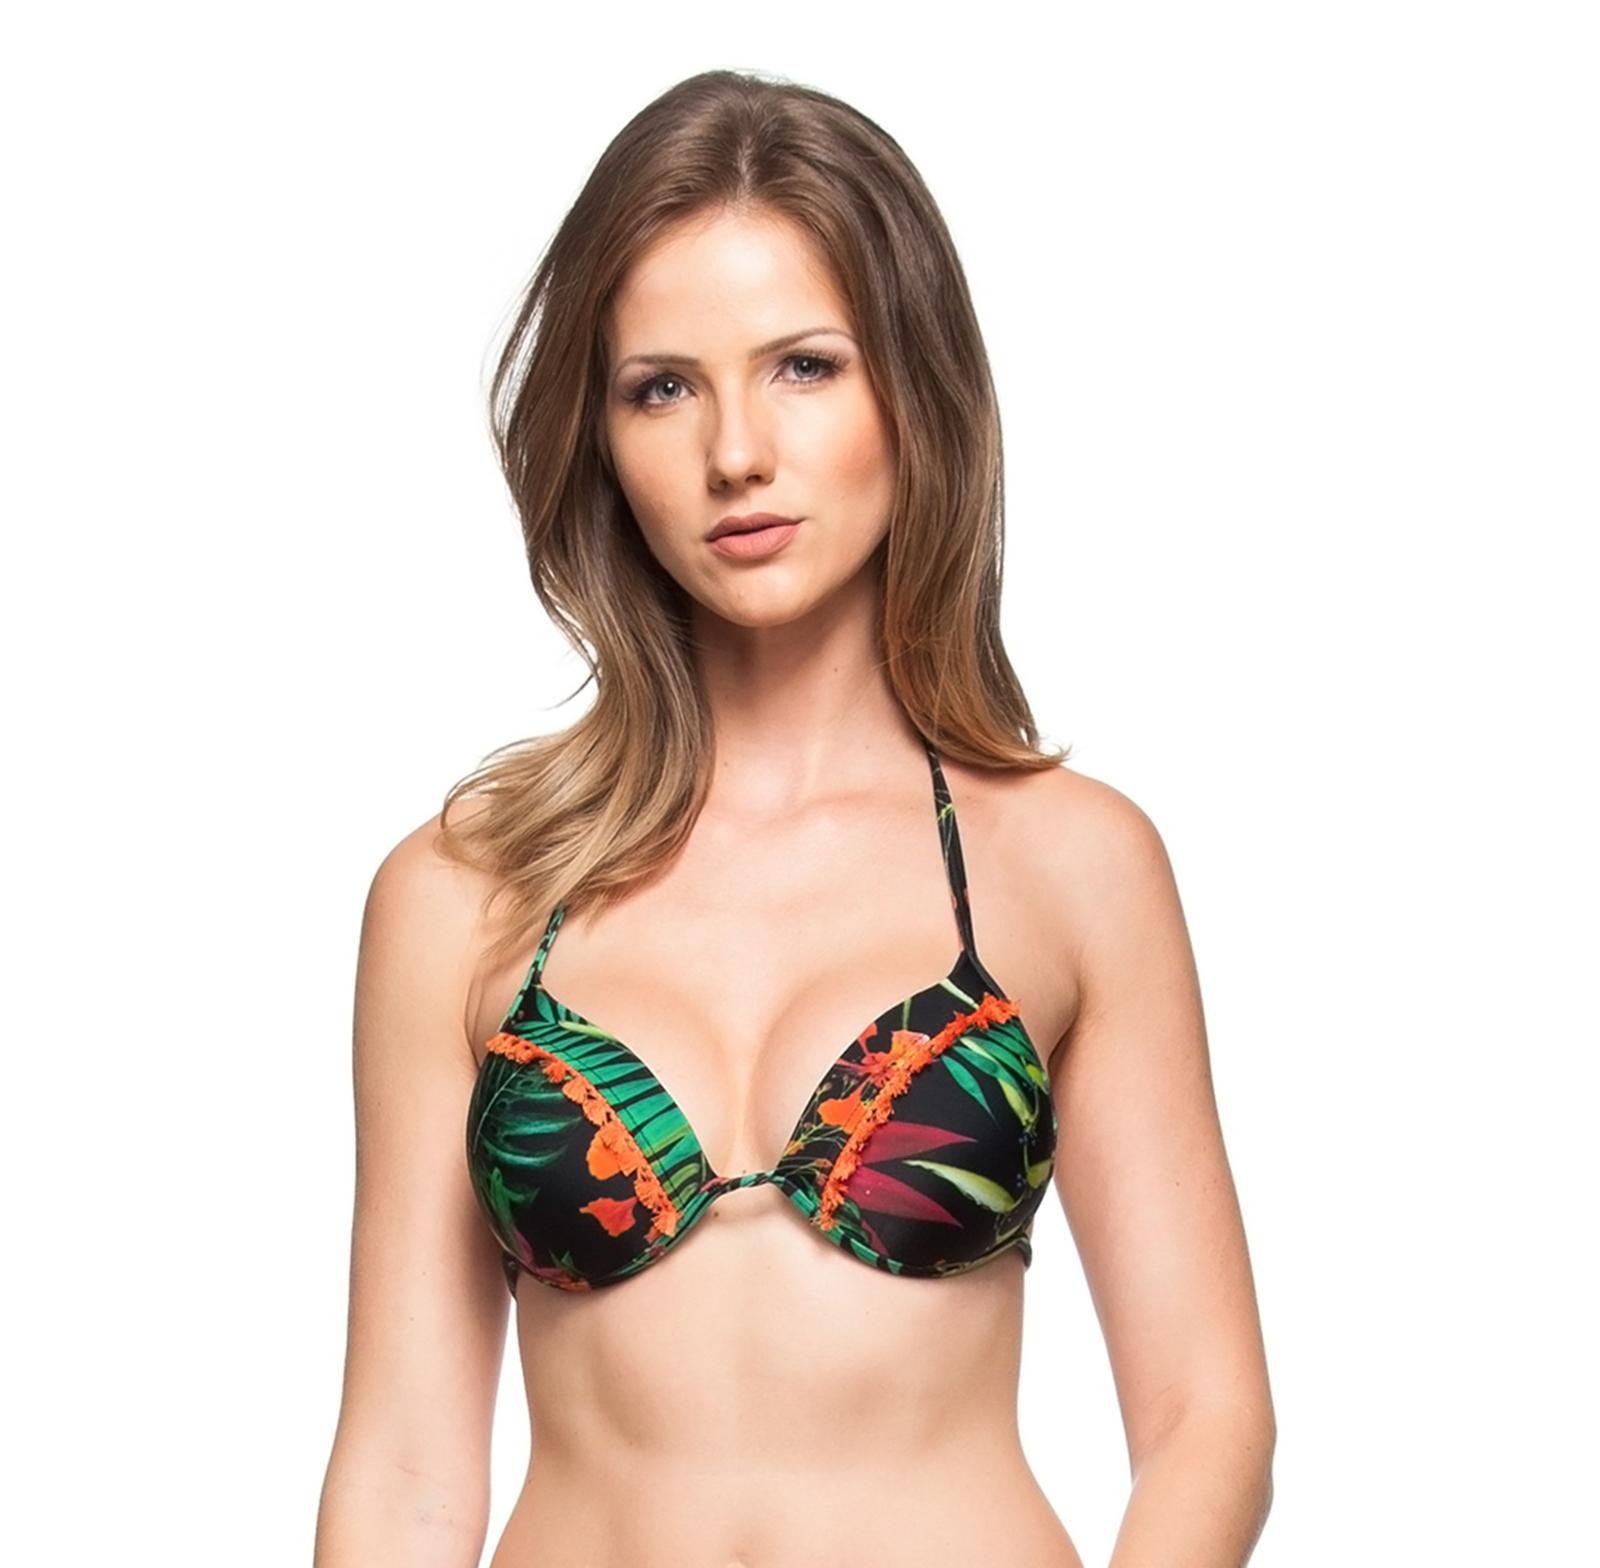 655348e384 Hard Padded Black Brazilian Bikini Top With Tropical Print And Orange  Pompons - Top Ilha Bonita